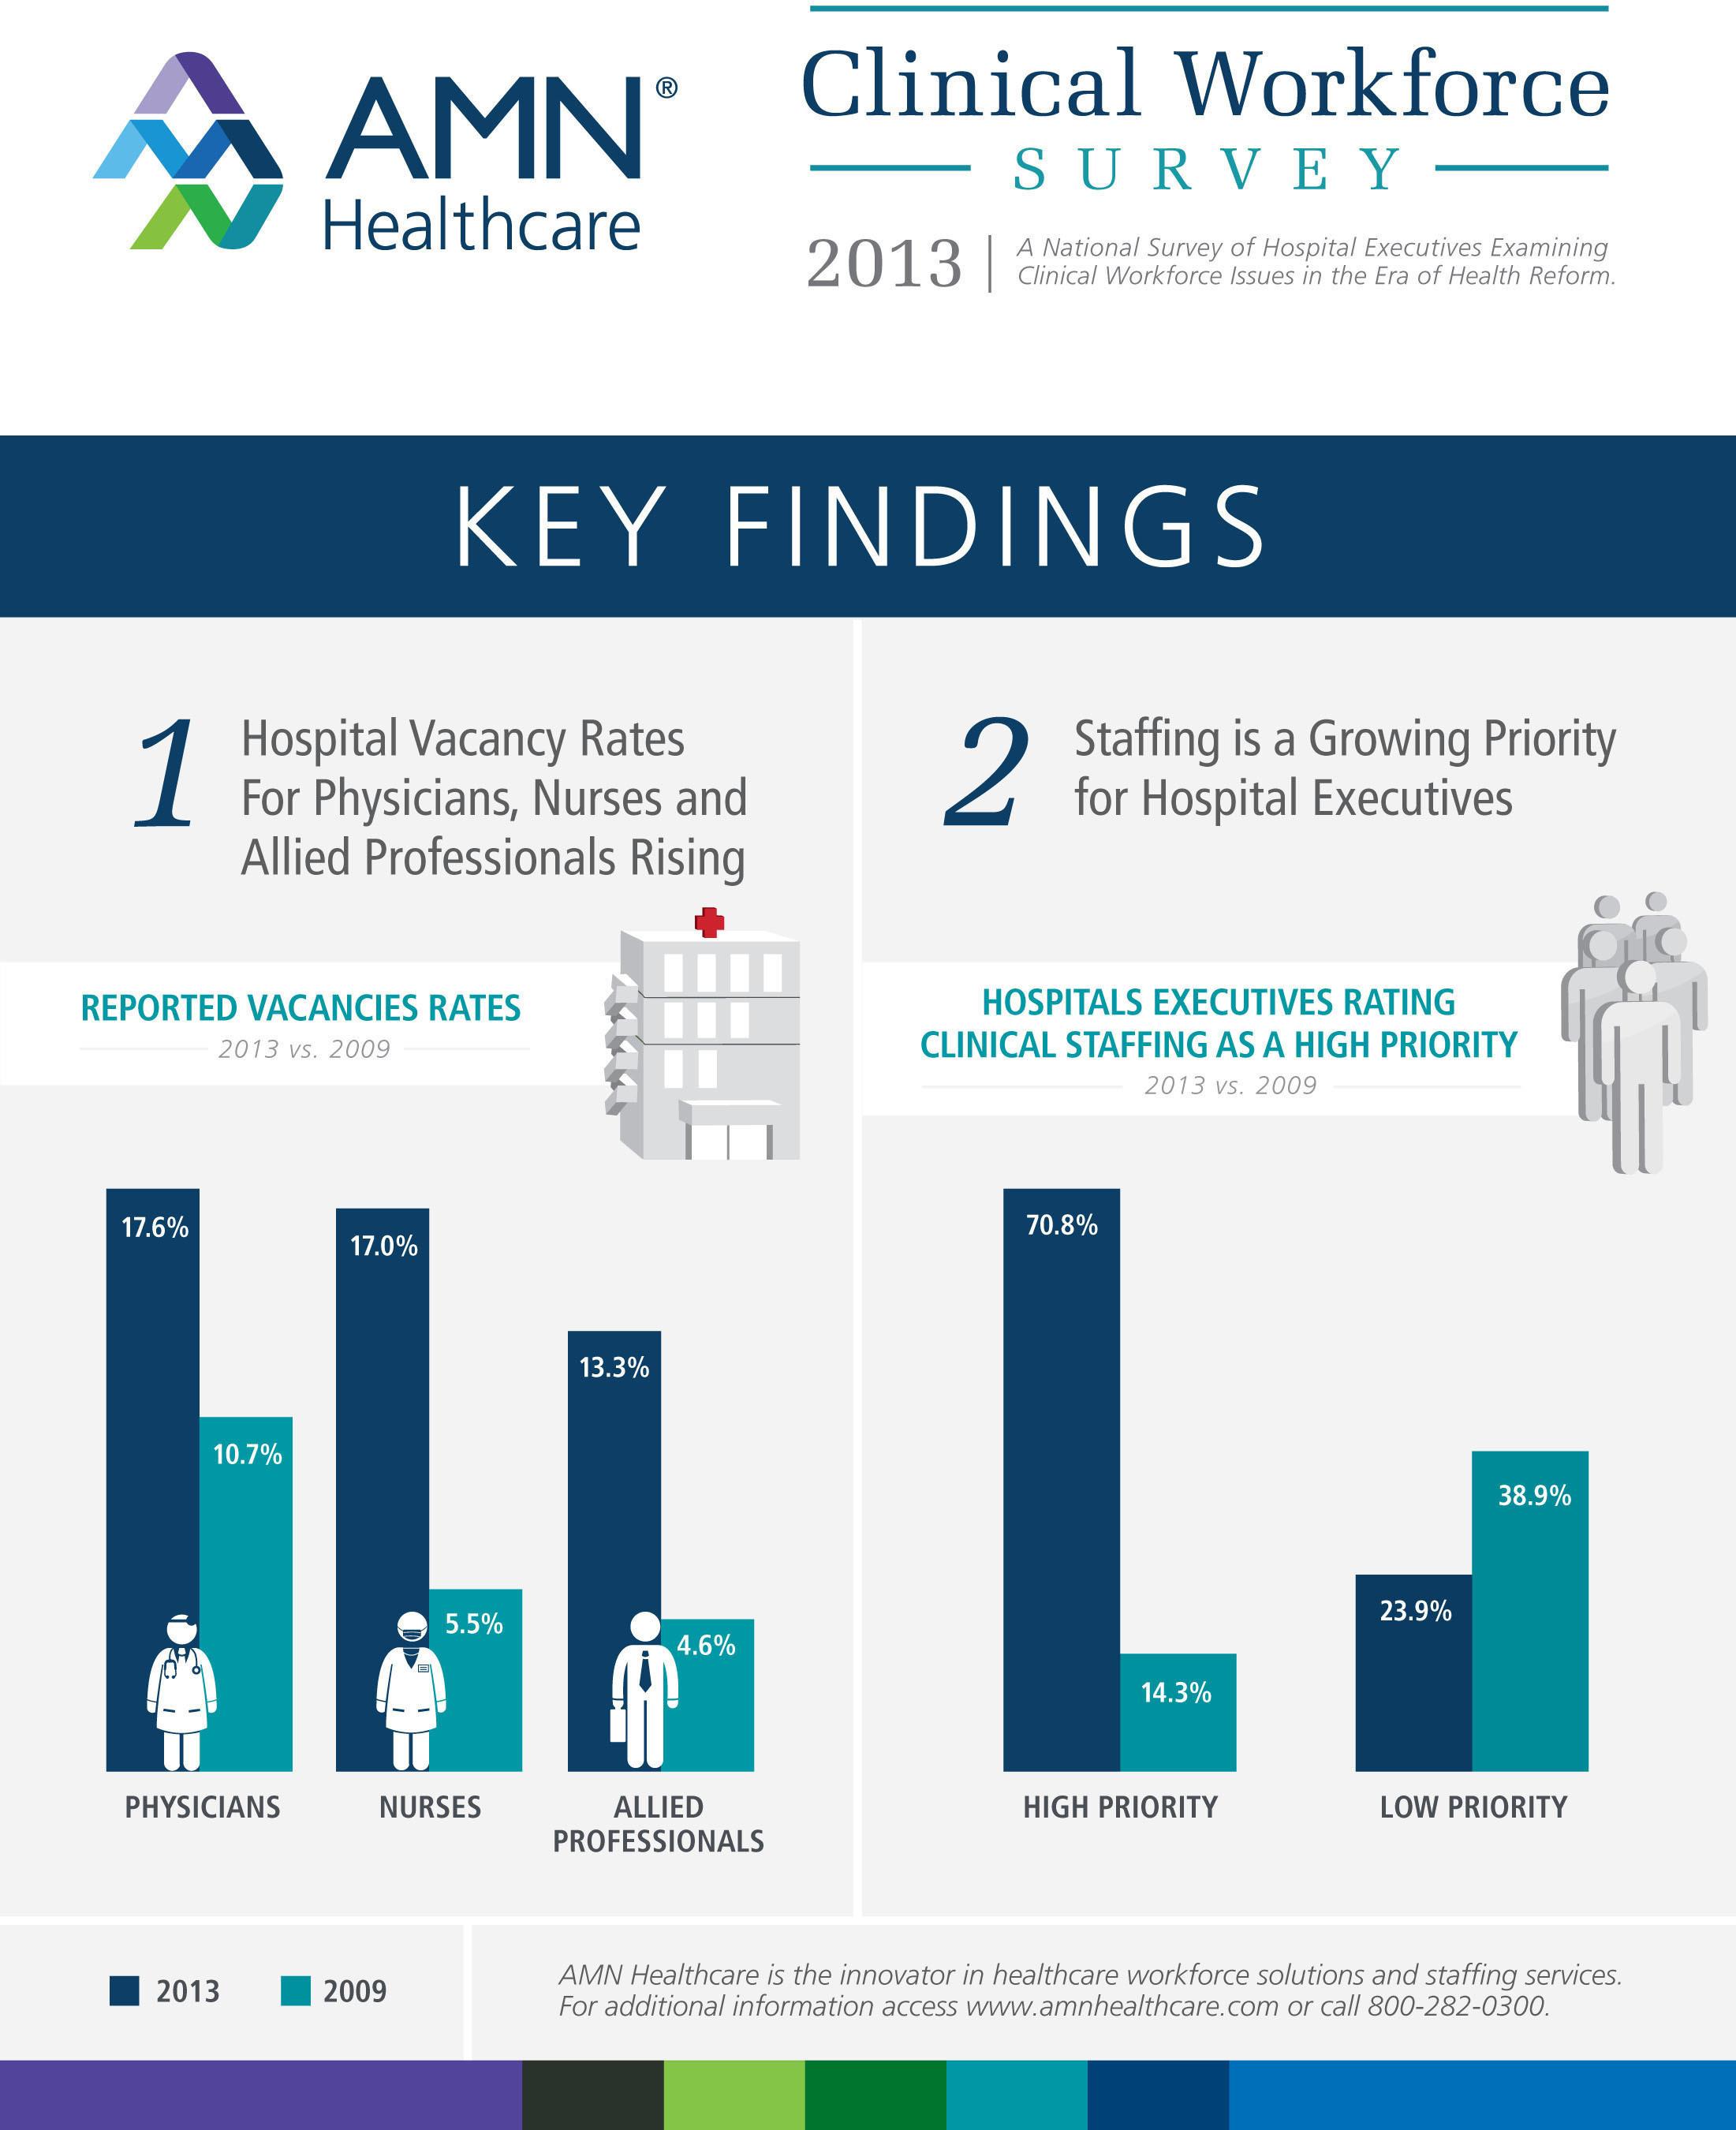 2013 Clinical Workforce Survey Key Findings. (PRNewsFoto/AMN Healthcare Services, Inc.) (PRNewsFoto/AMN ...